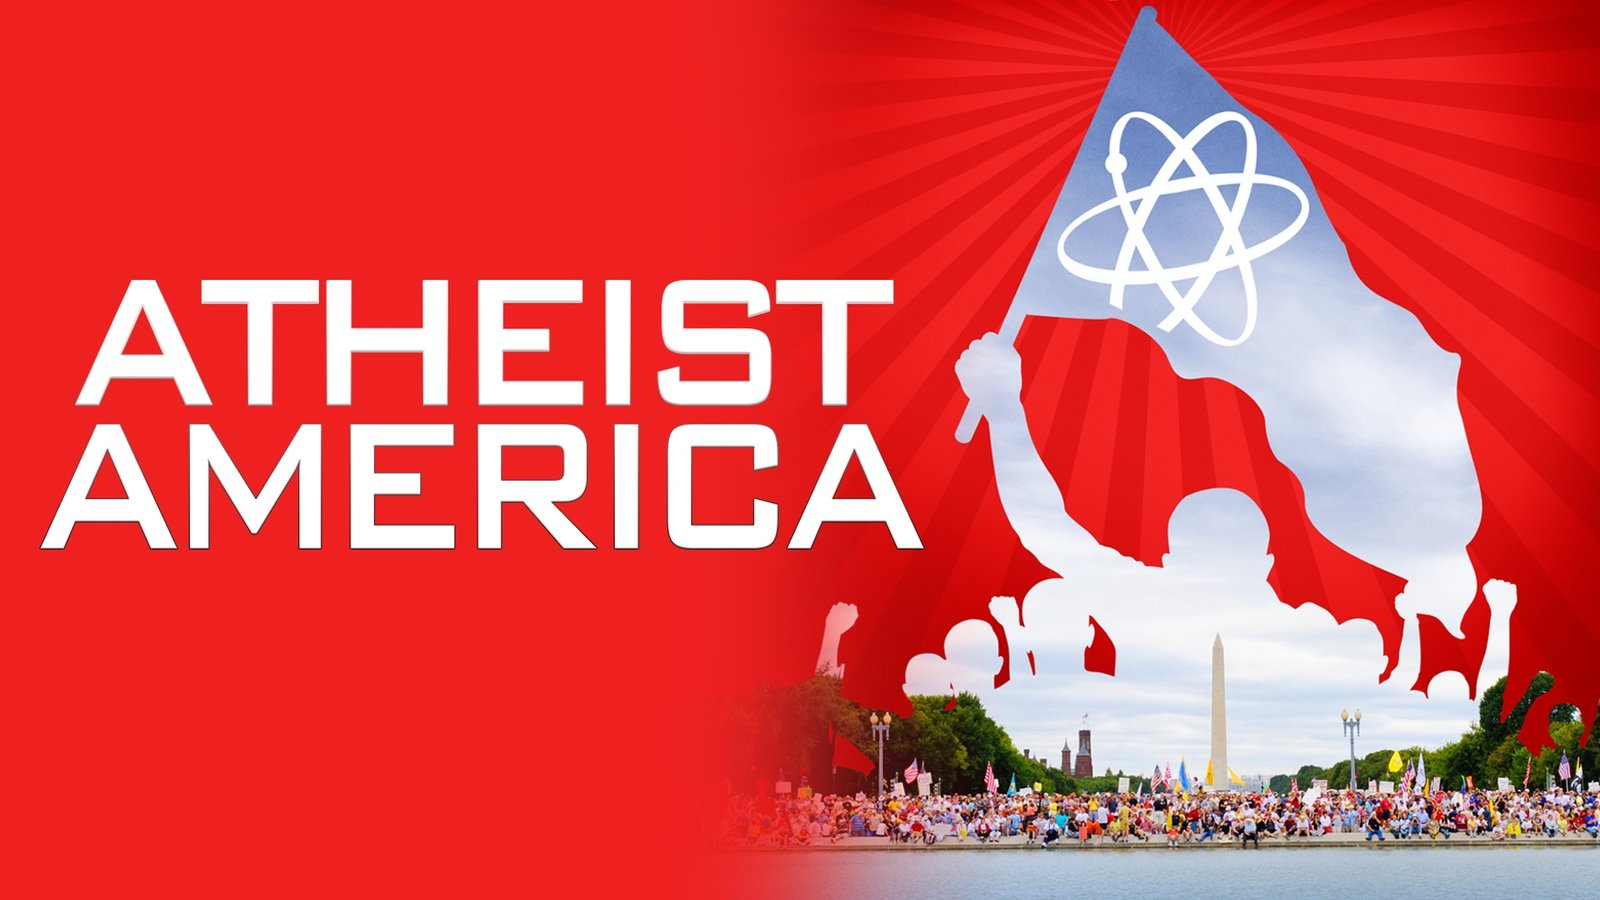 Atheist America - Documenting an Atheist Talk Show